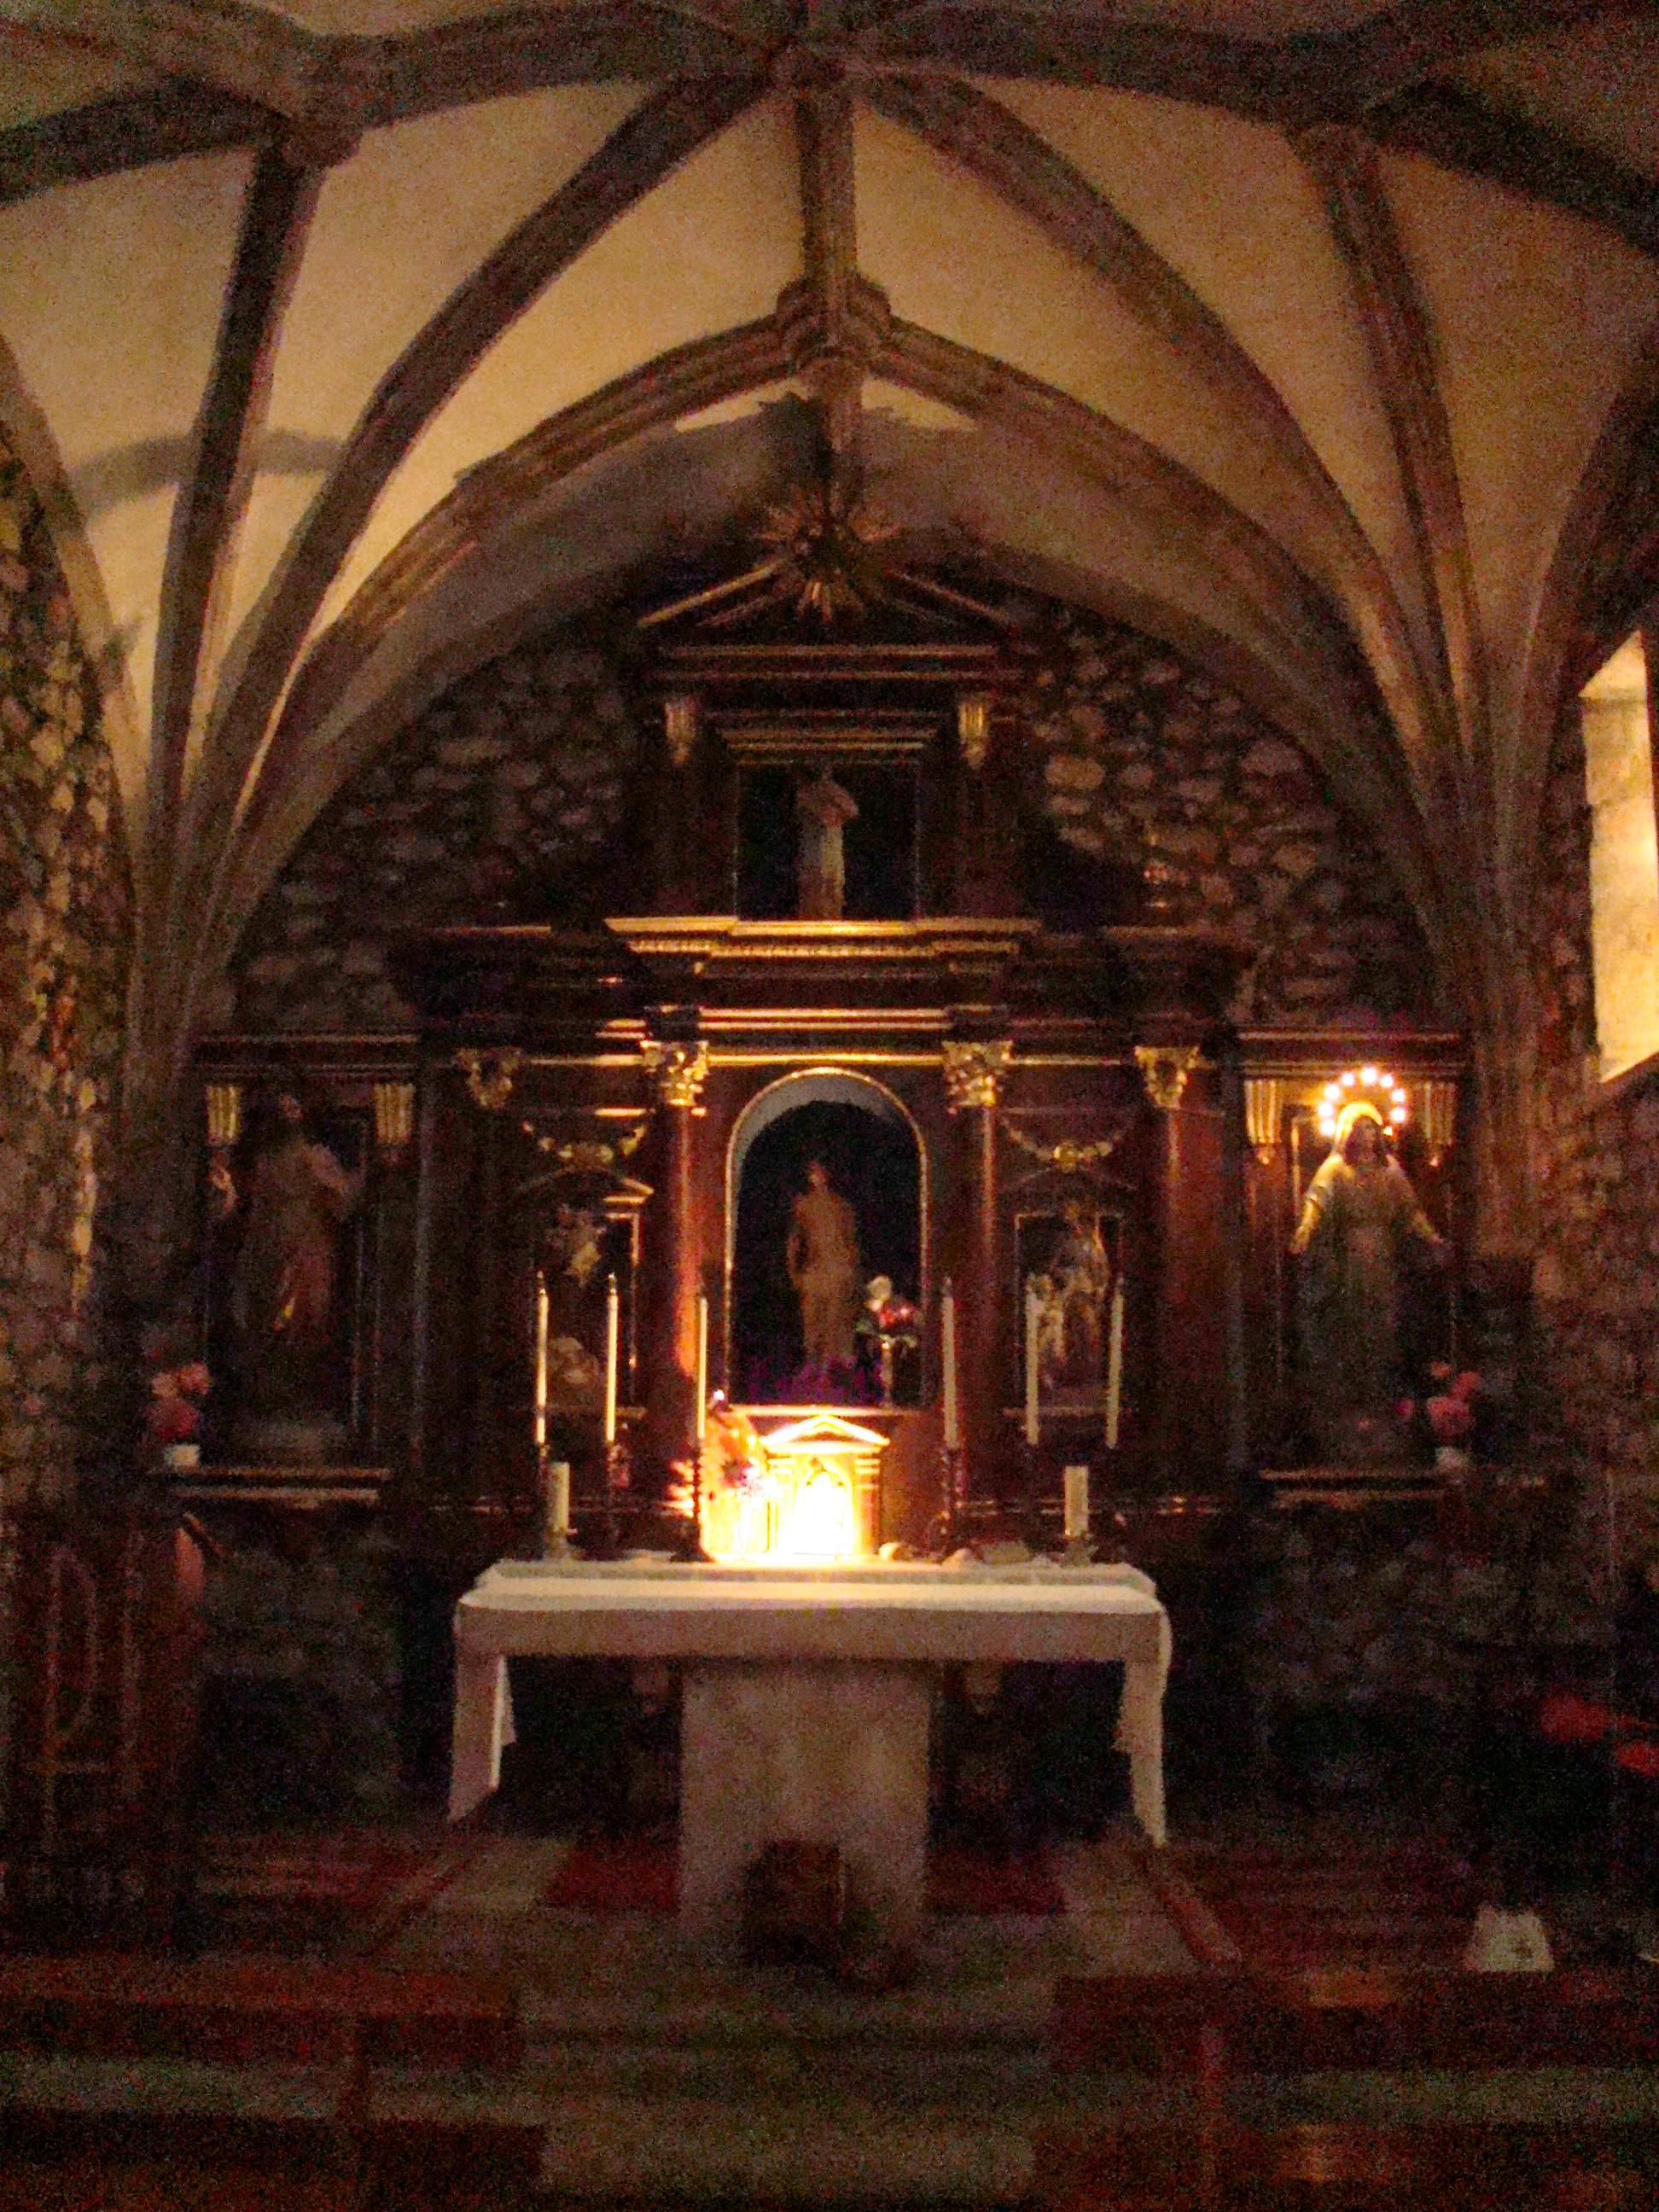 http://upload.wikimedia.org/wikipedia/commons/6/64/Cantabria_Garabandal_iglesia_interior_lou.jpg